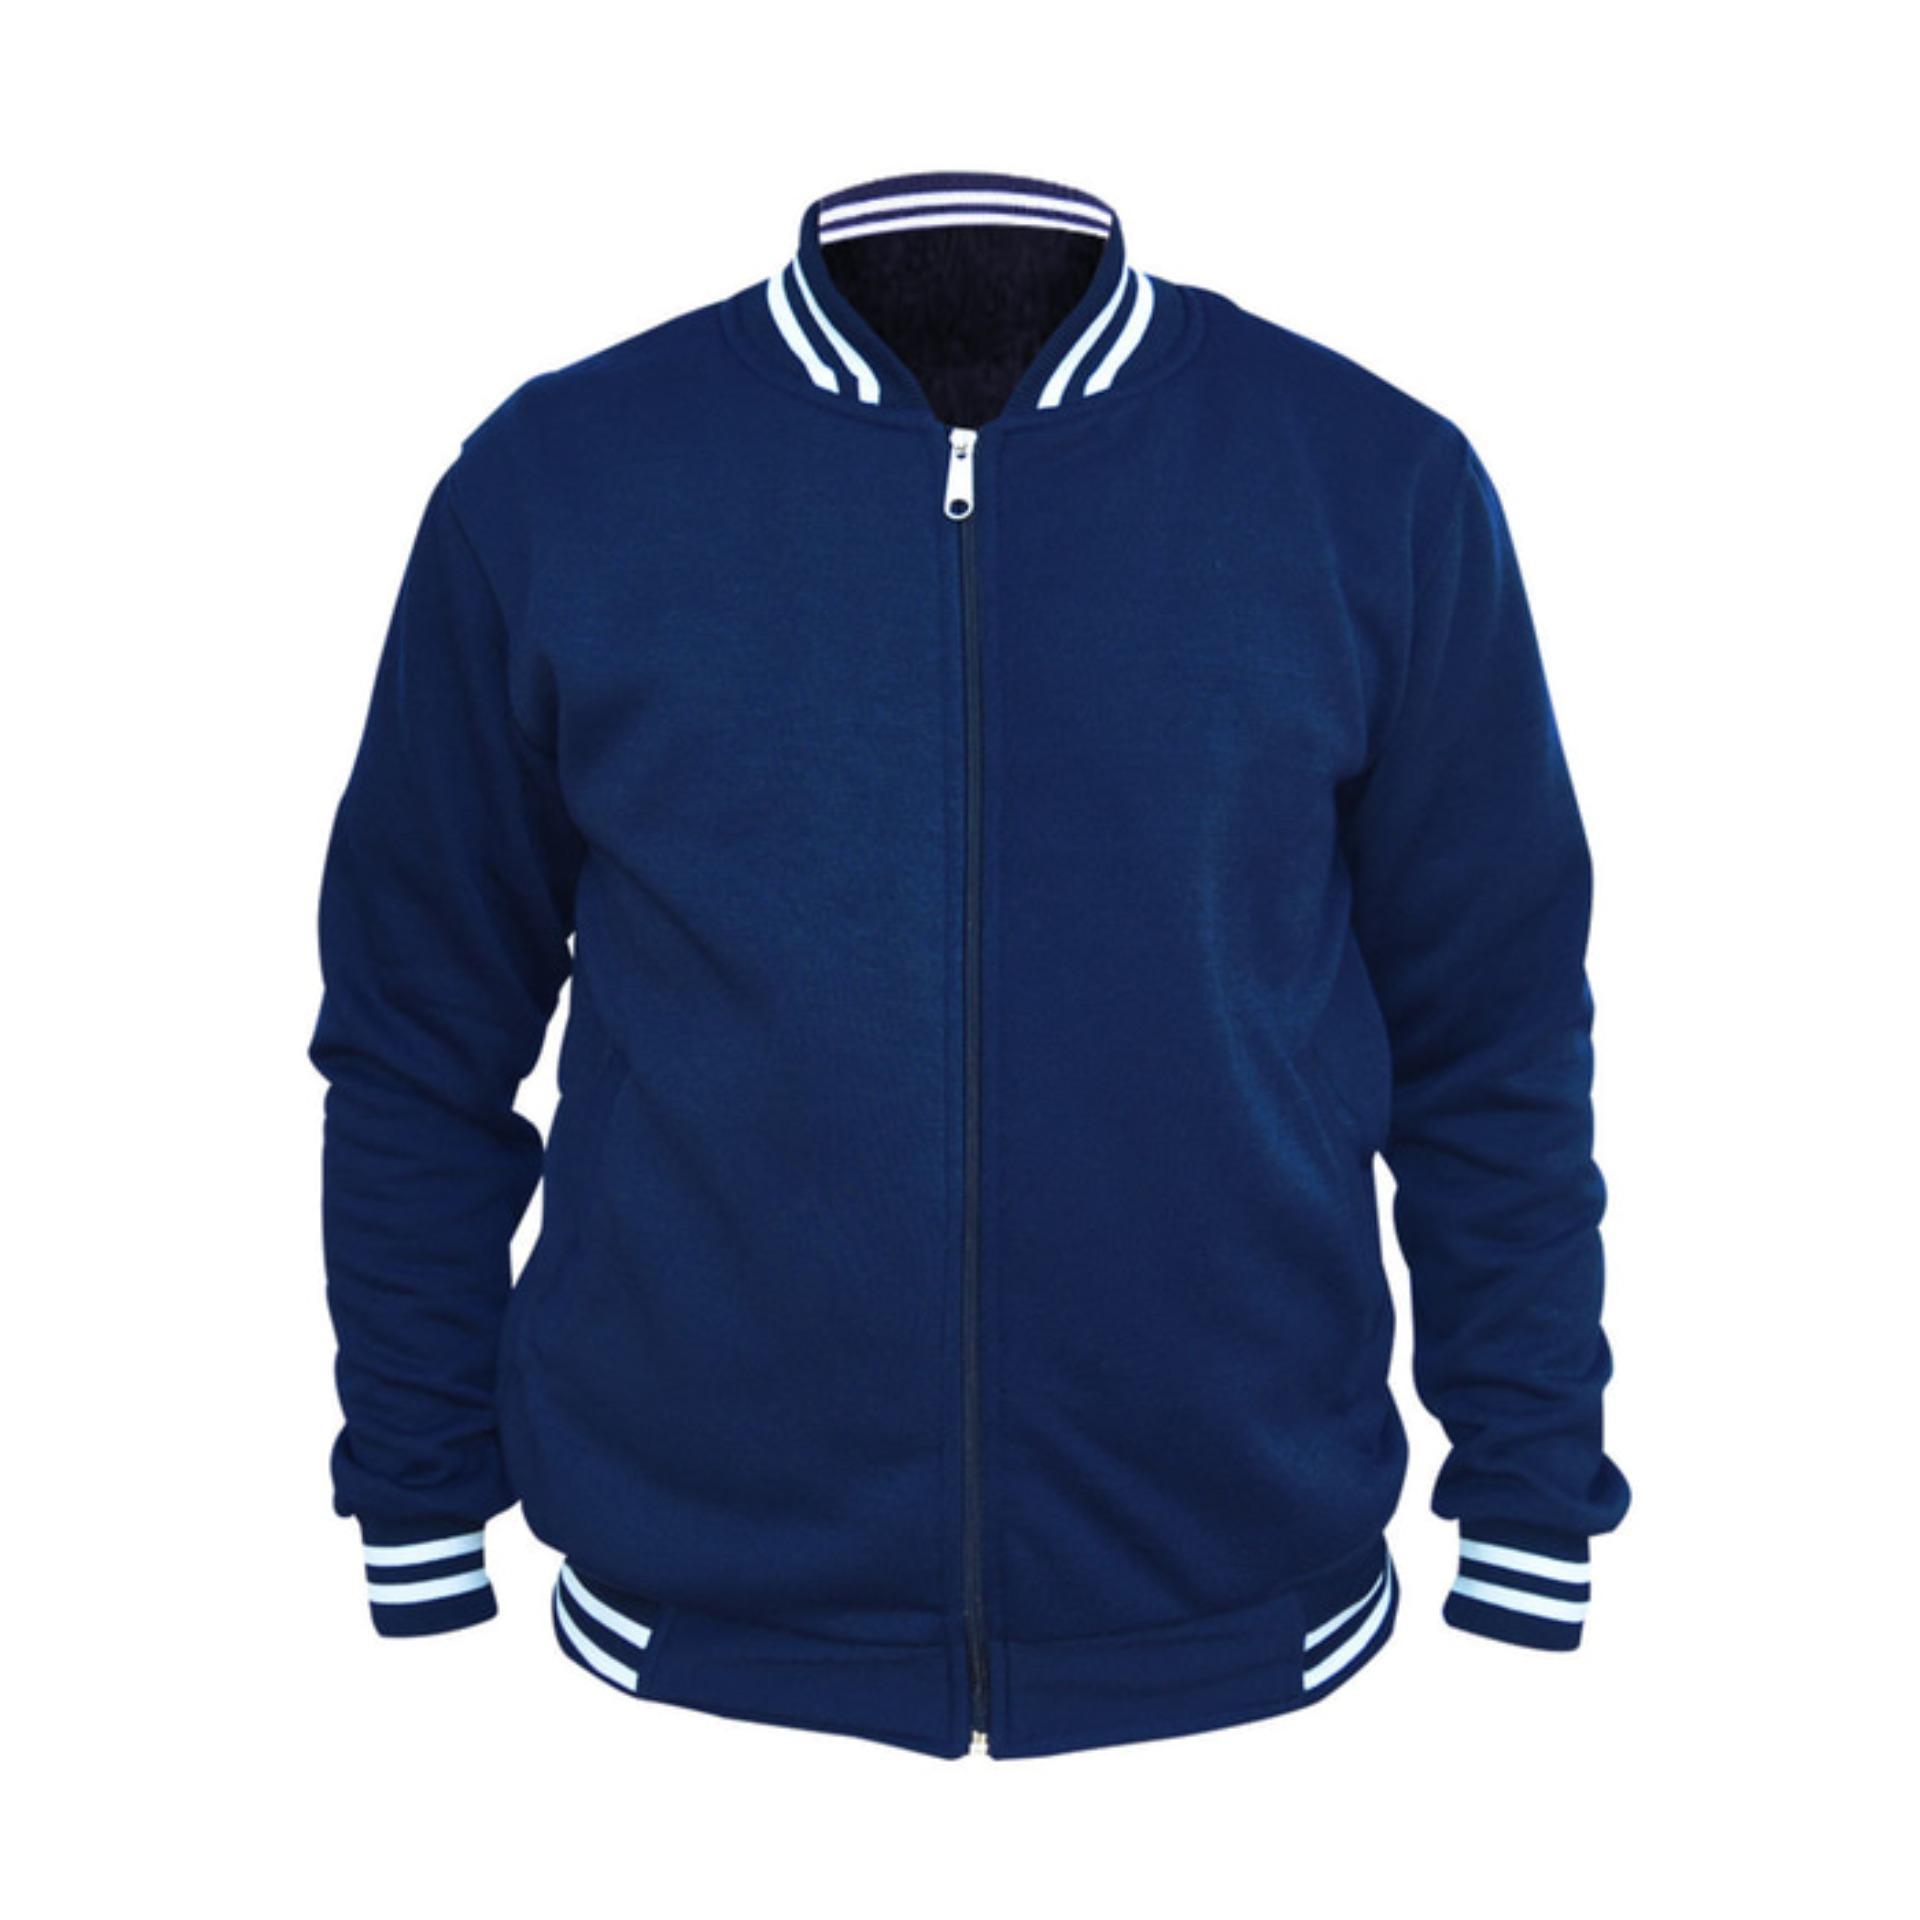 Belanja Murah Jaket Baseball Varsity Polos Biru Navy Dongker Zipper Keren